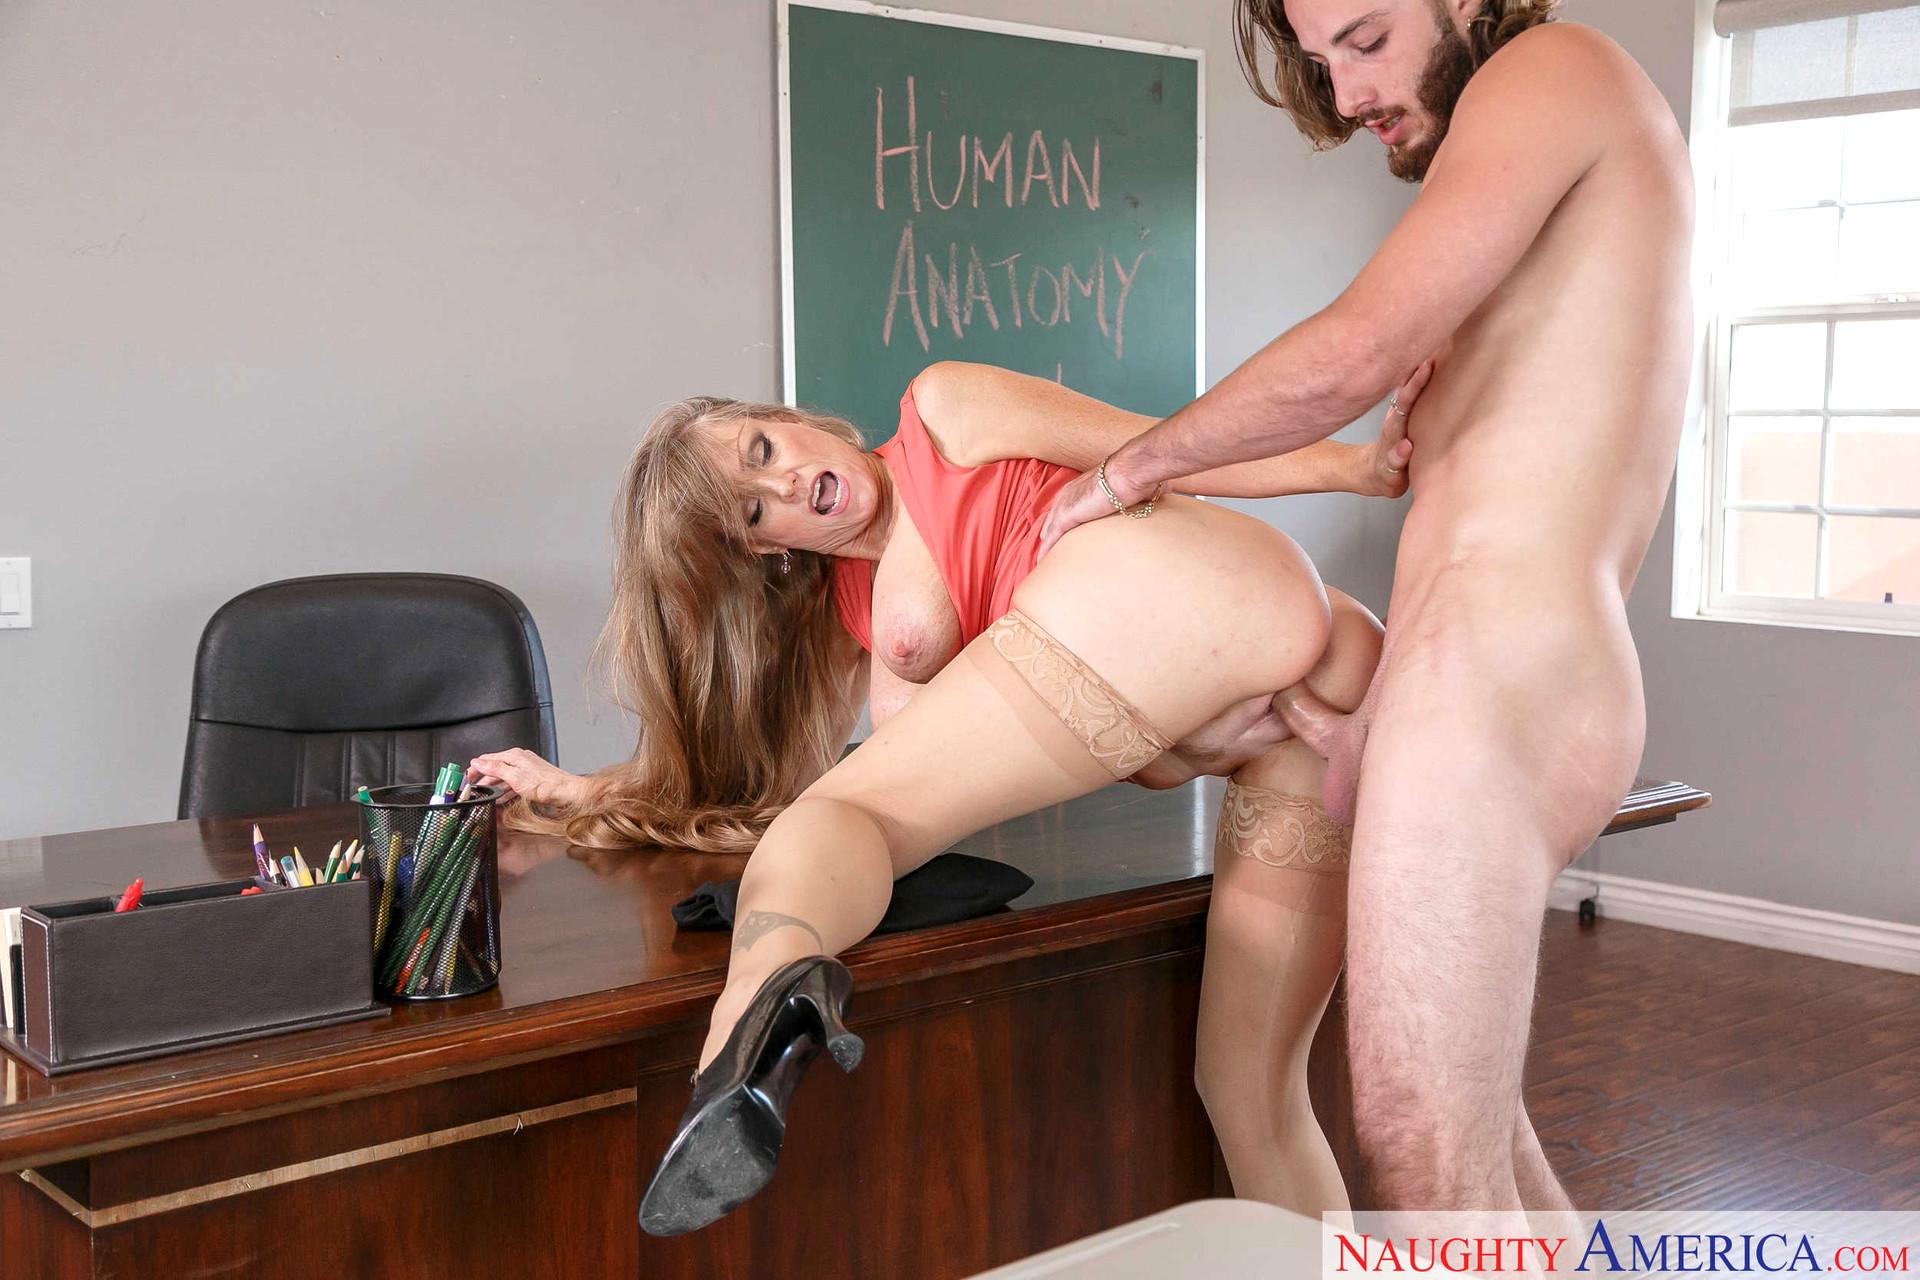 Student teacher sexual misconduct